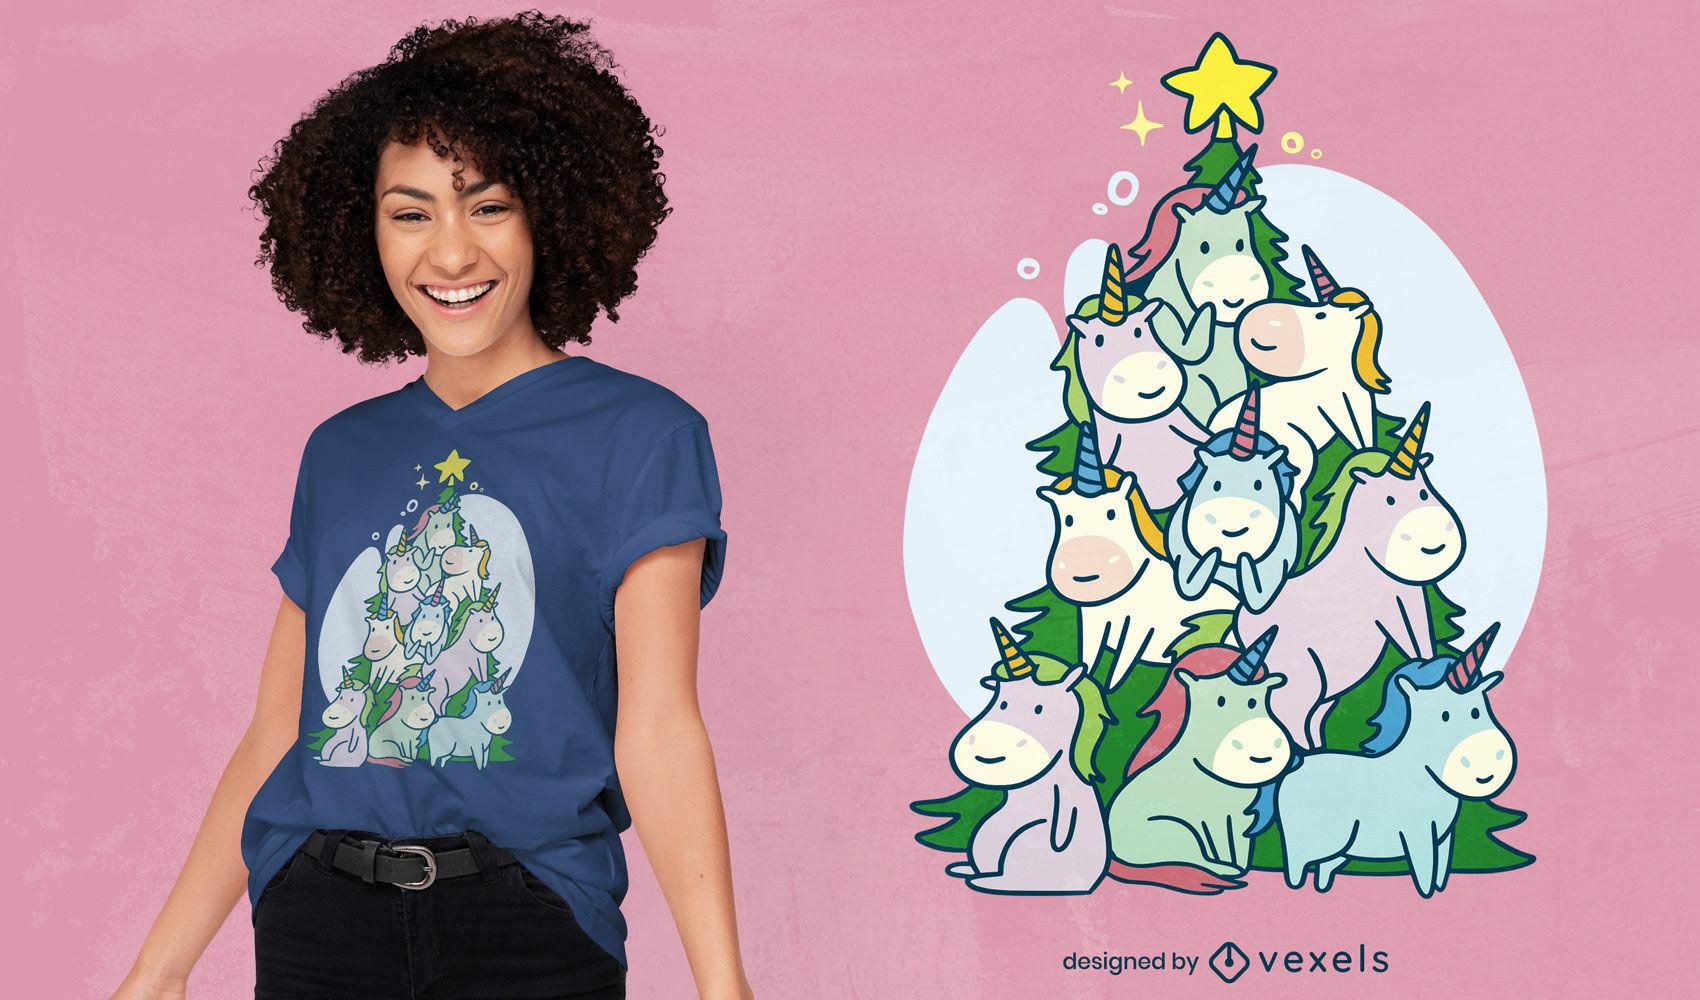 Dise?o de camiseta de ?rbol de navidad de unicornios.